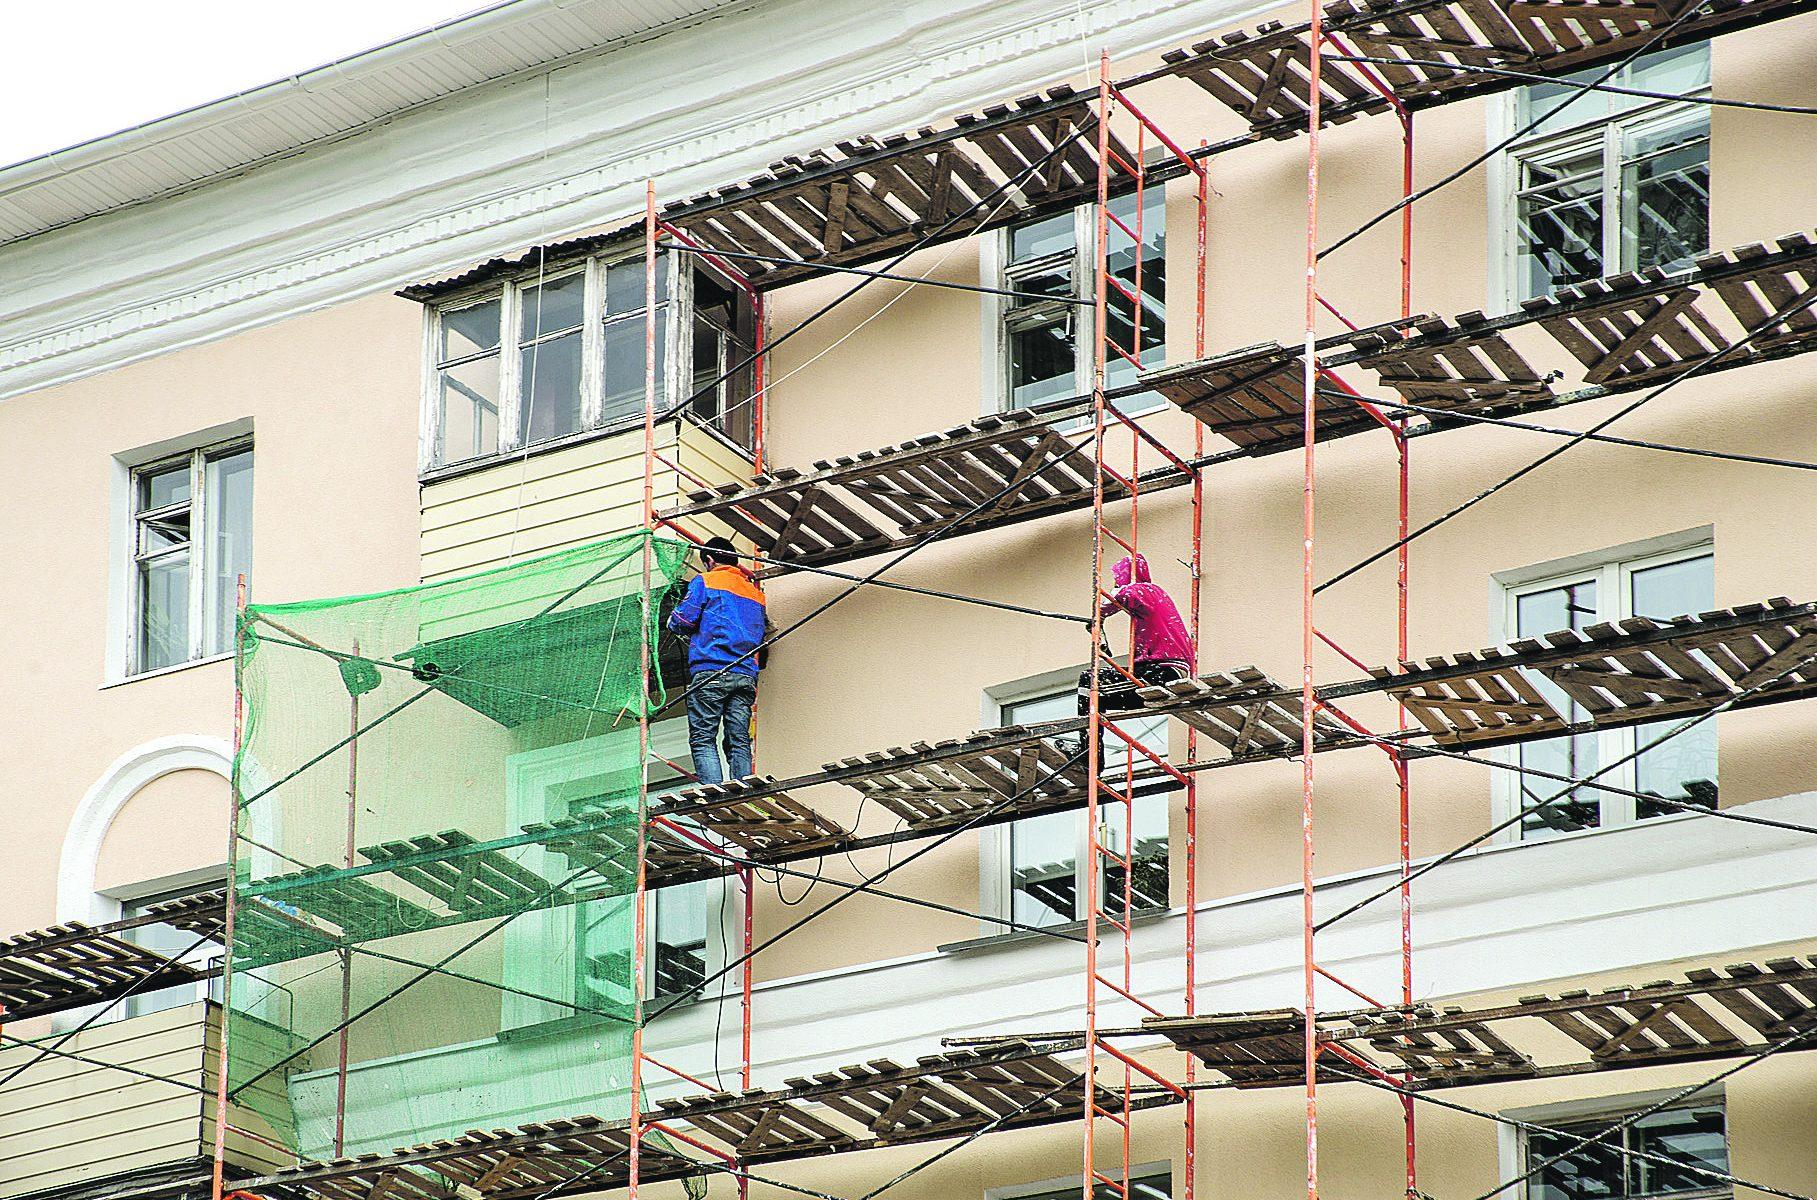 ремонт штукатурки фасадов зданий